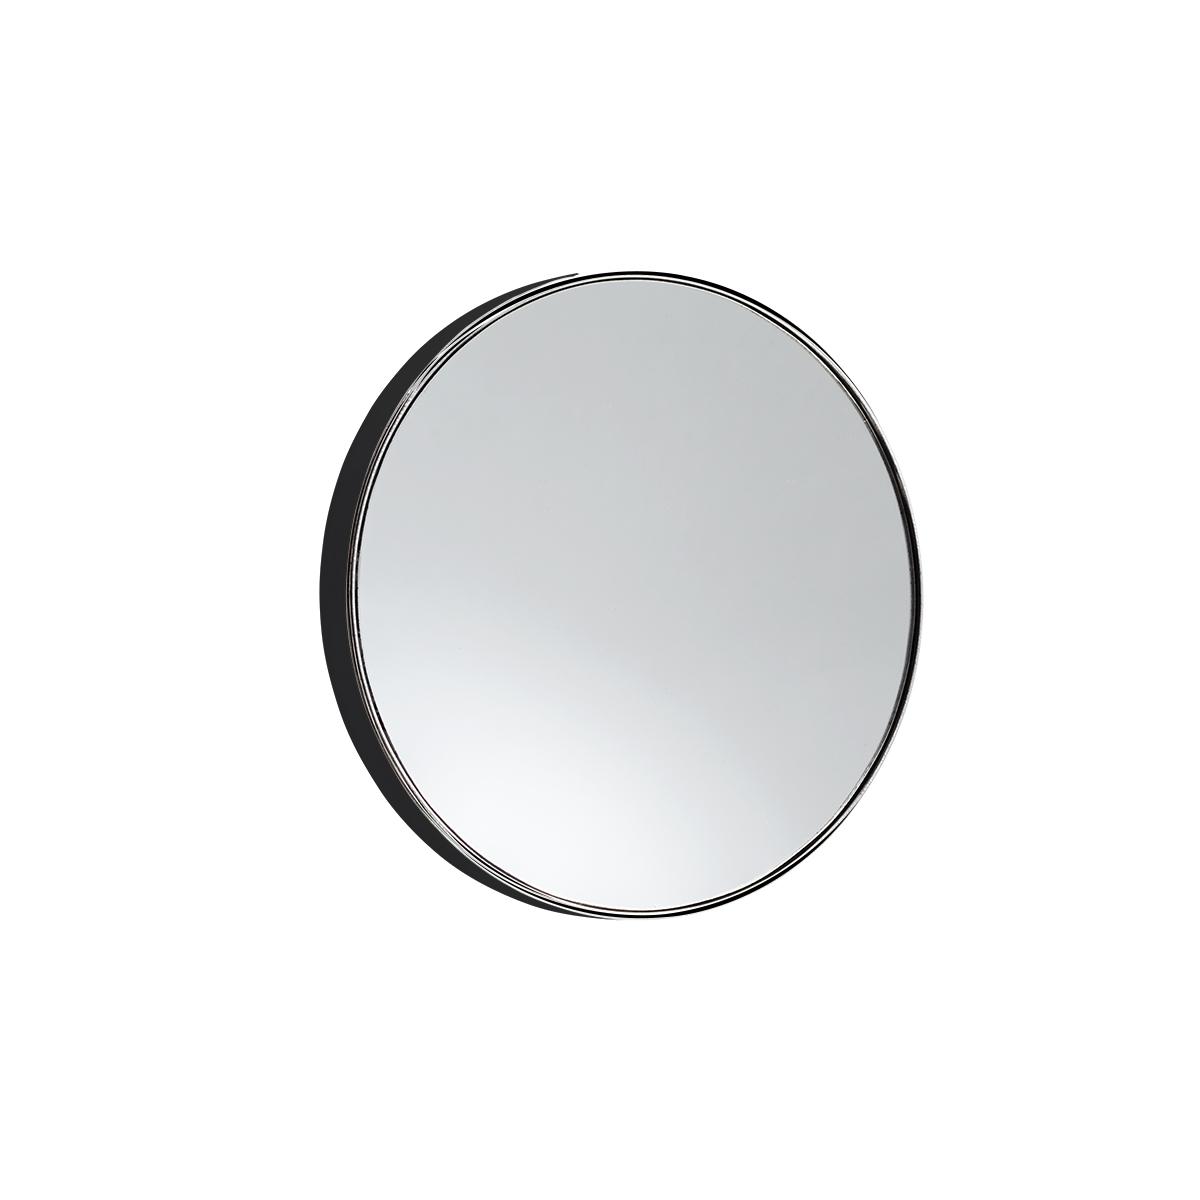 10X Macro Suction Mirror